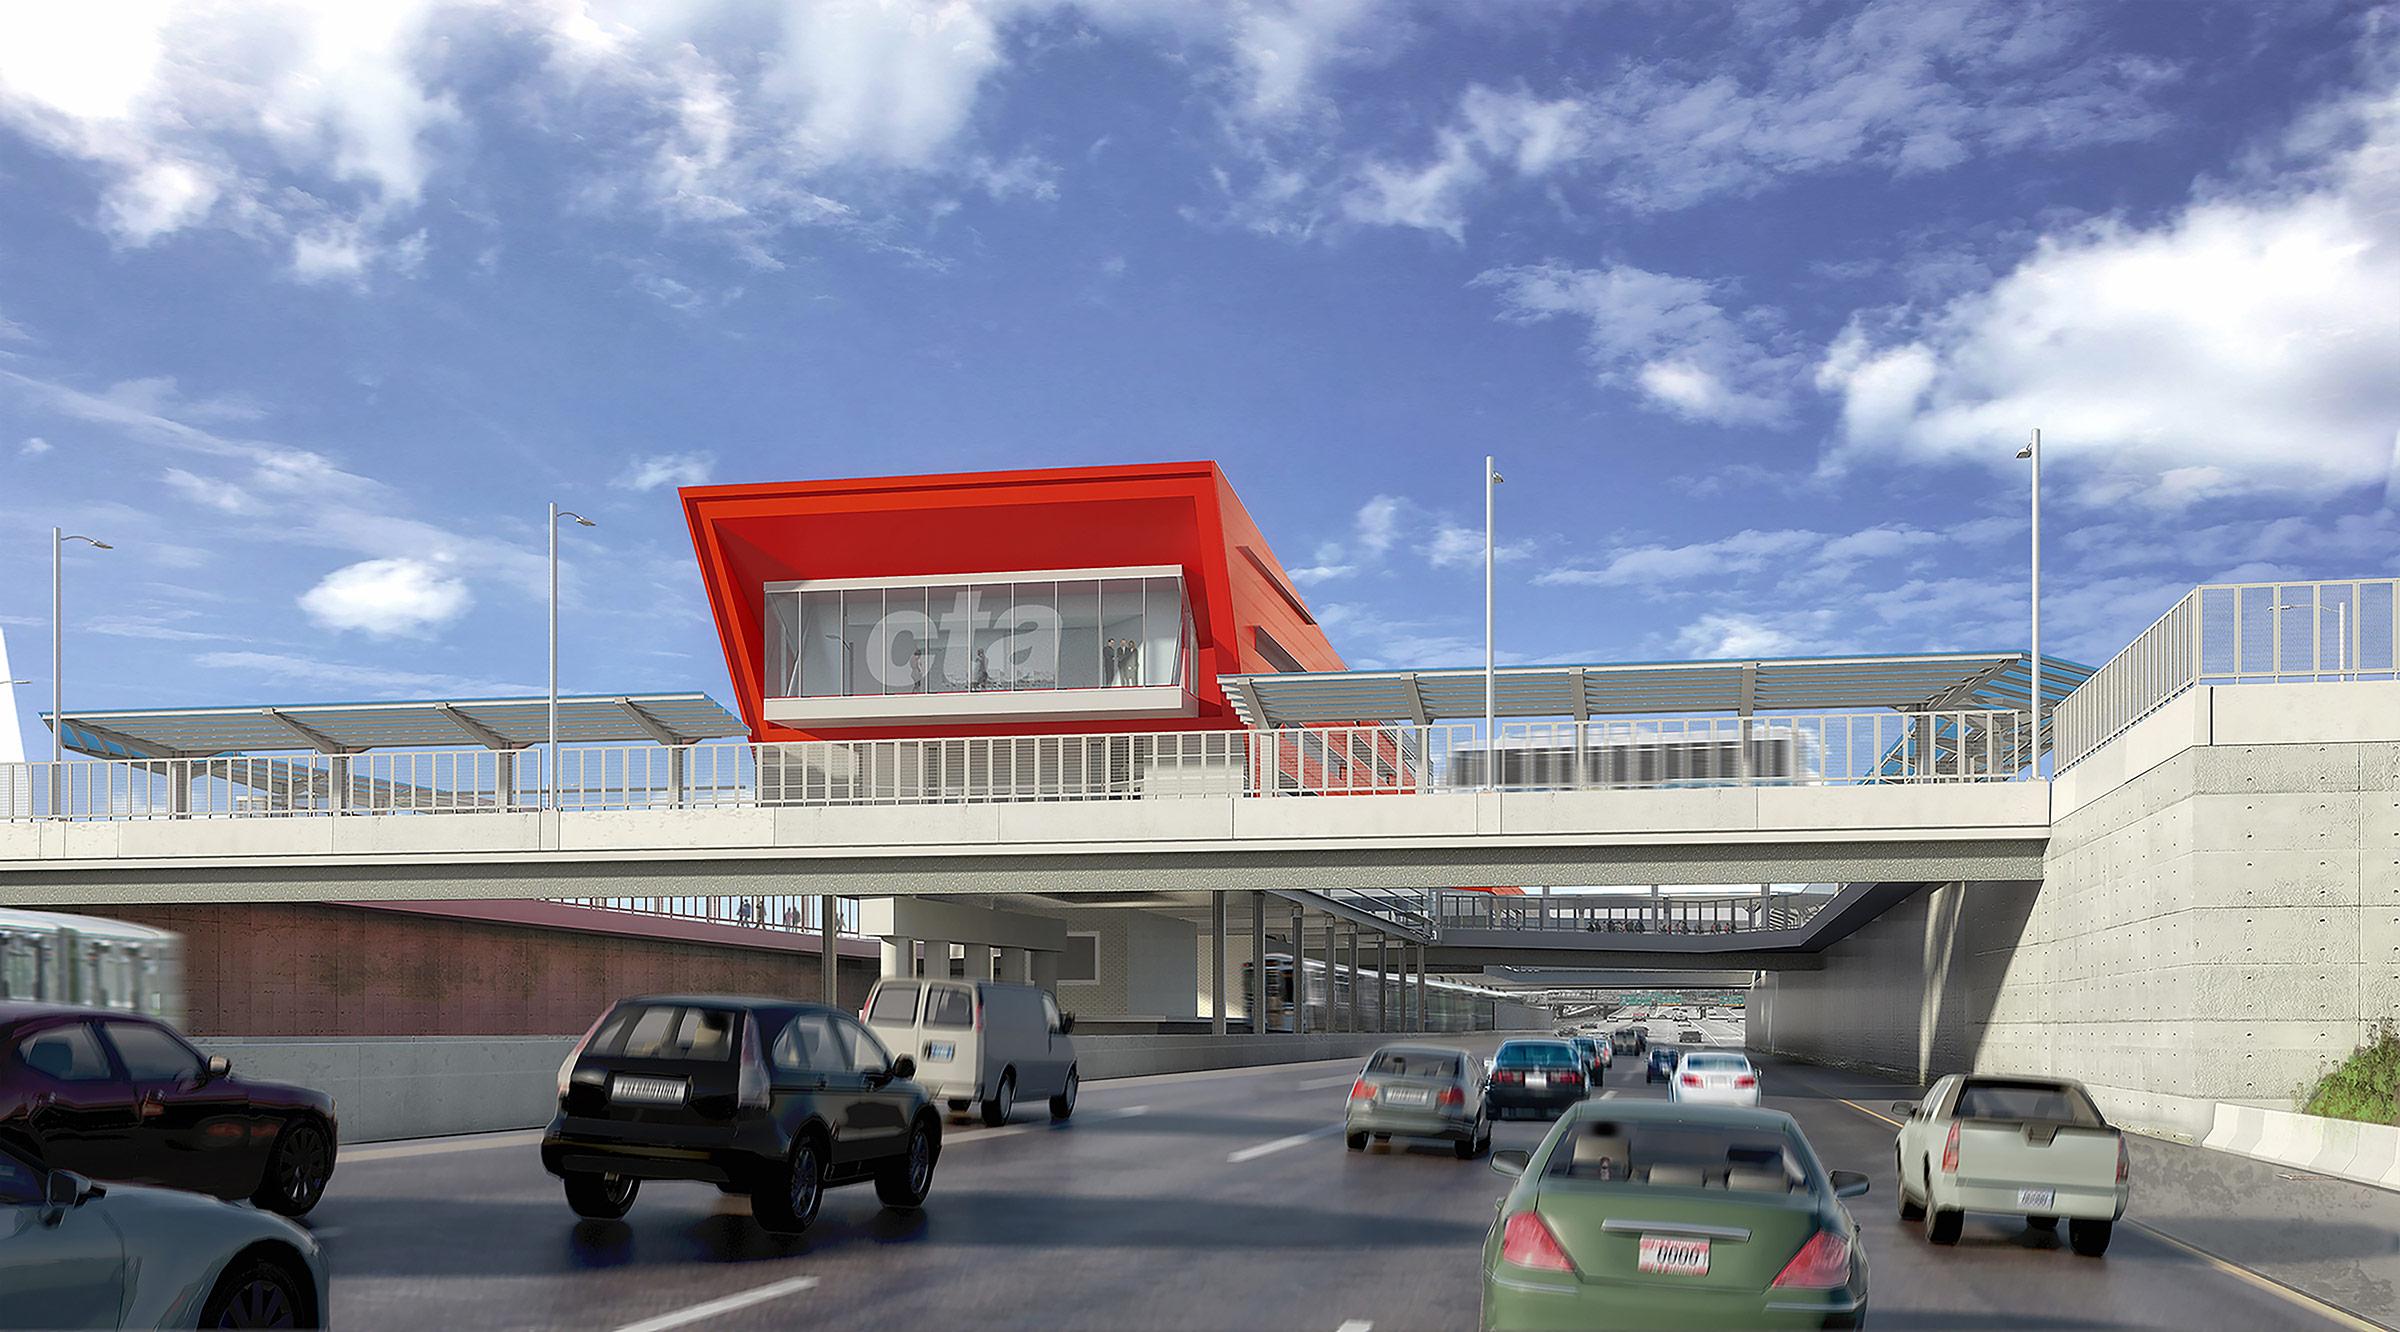 95th dan ryan red line l station renders released archpaper 95thdan ryan cta sciox Gallery